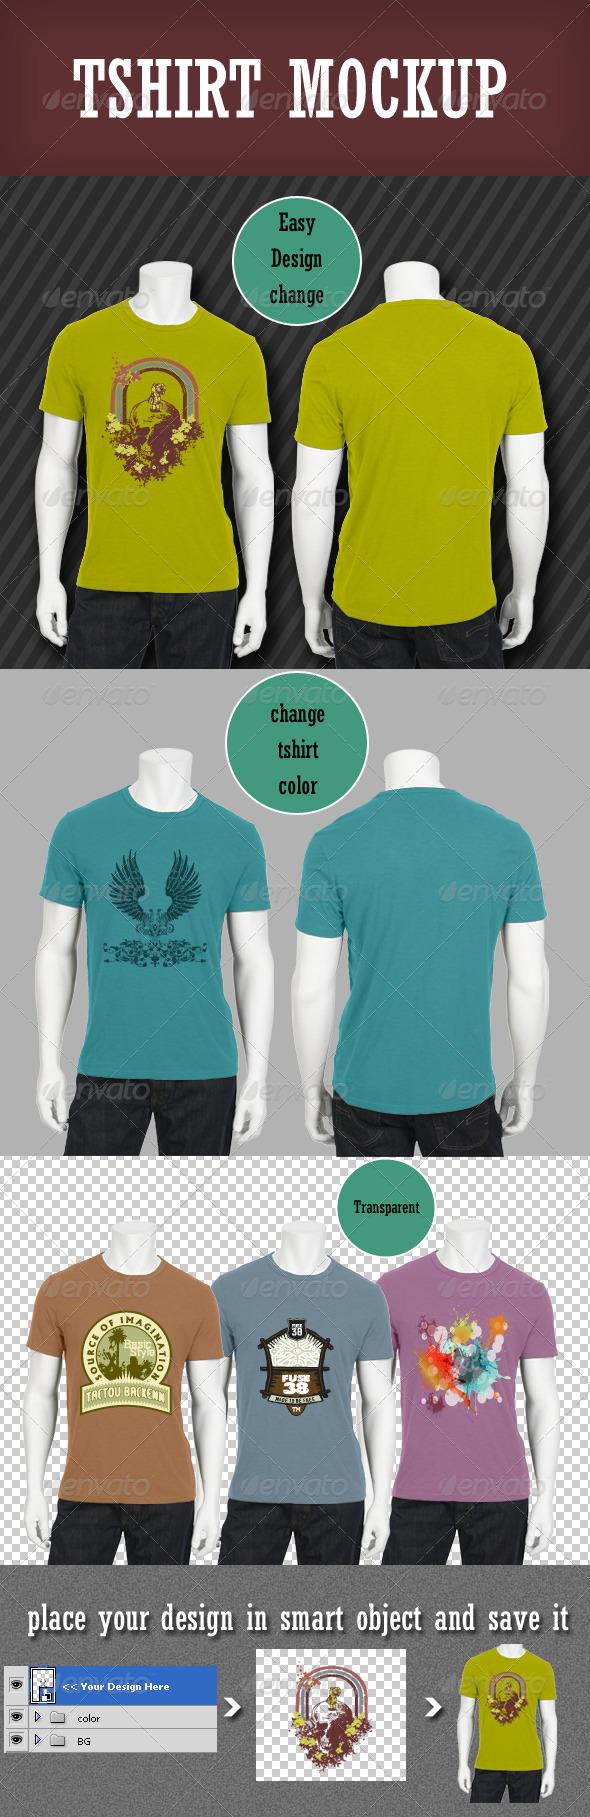 GraphicRiver Tshirt Mockup 3101459